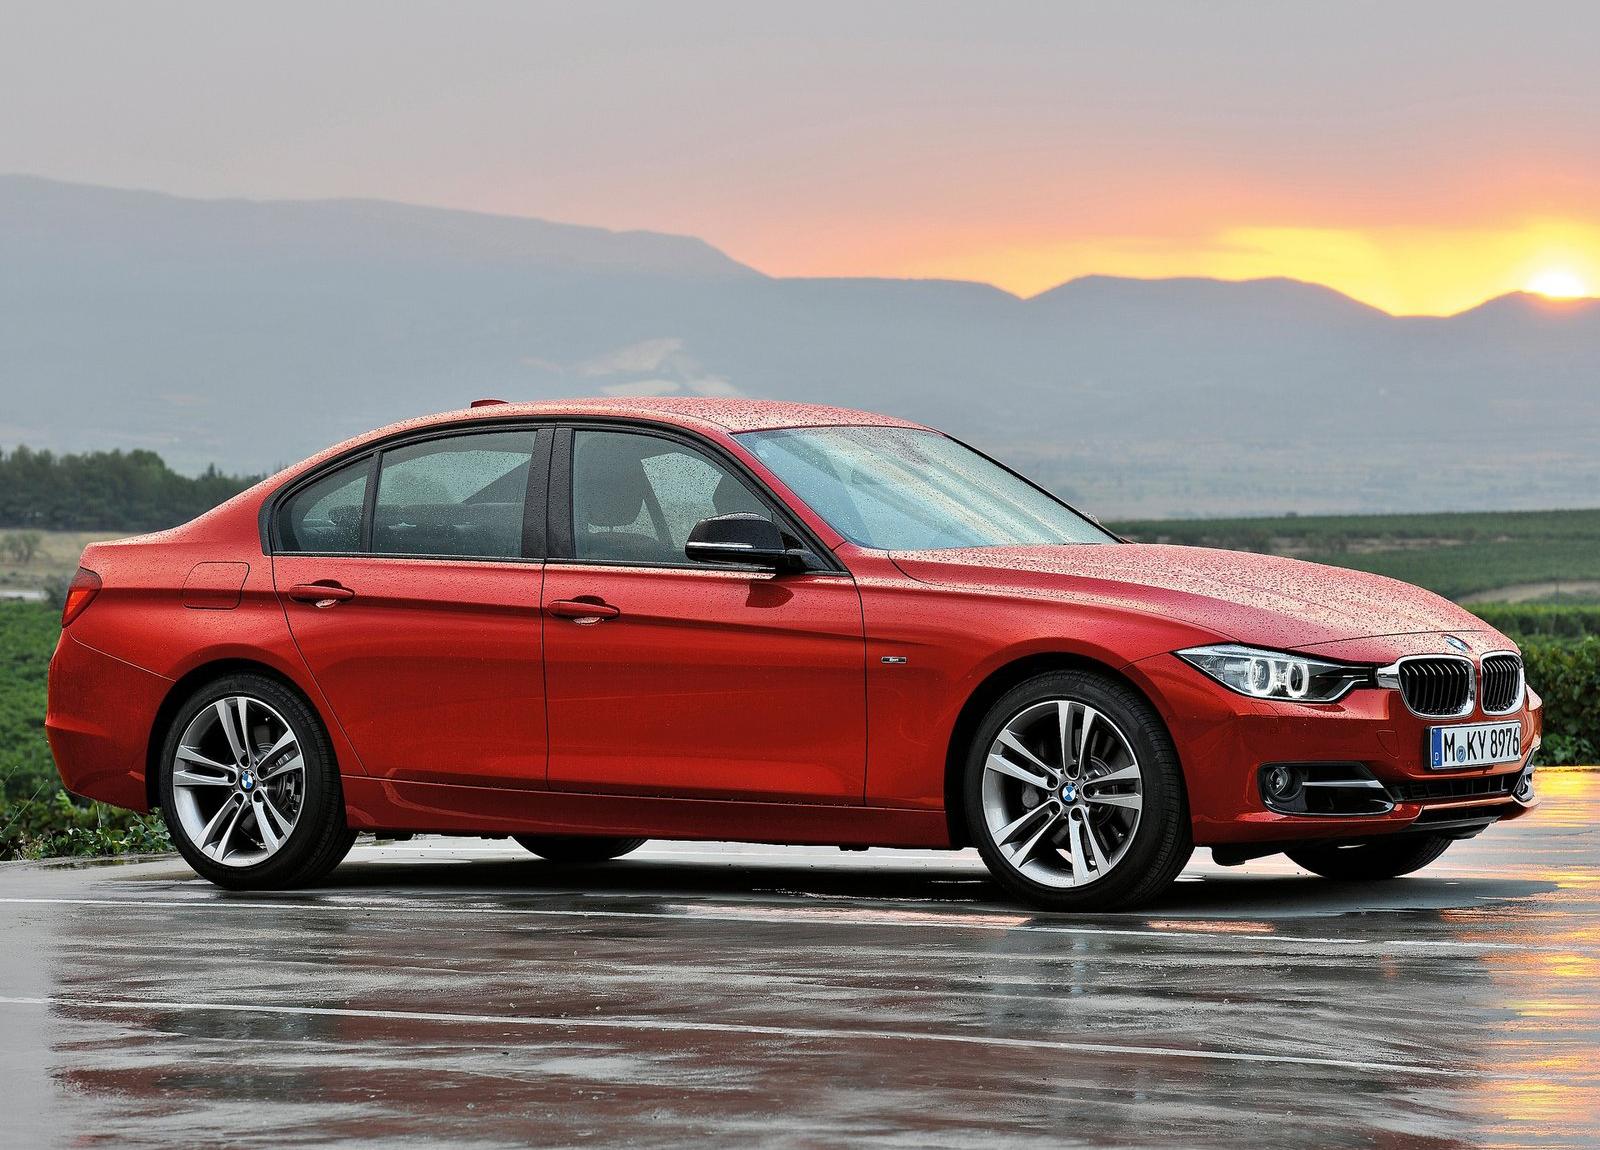 http://1.bp.blogspot.com/-cB7qO-sg21c/UCpzpa2MWsI/AAAAAAAAHFA/qbWIp5S2zf4/s1600/BMW-3-Series_2012_1600x1200_wallpaper_08.jpg